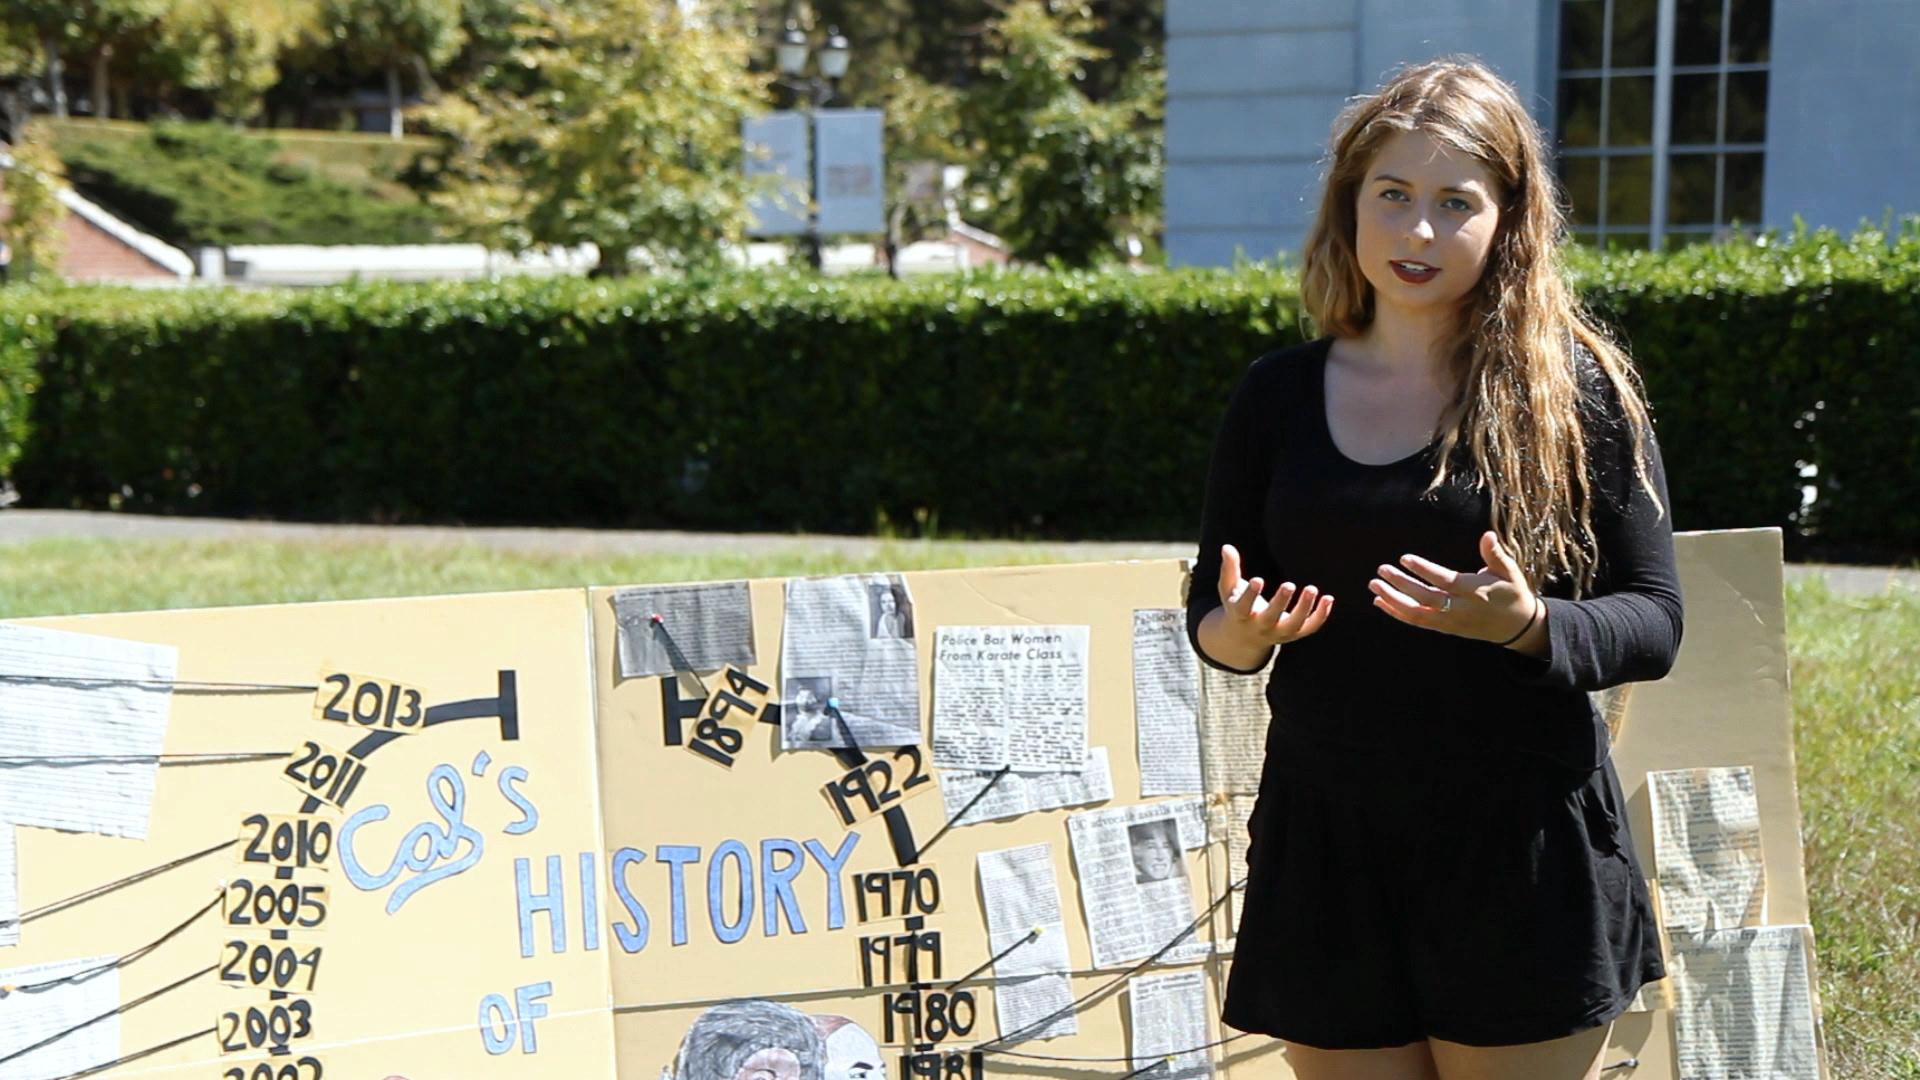 Teach-In: The History Of Sexual Violence At UC Berkeley, By Sofie Karasek